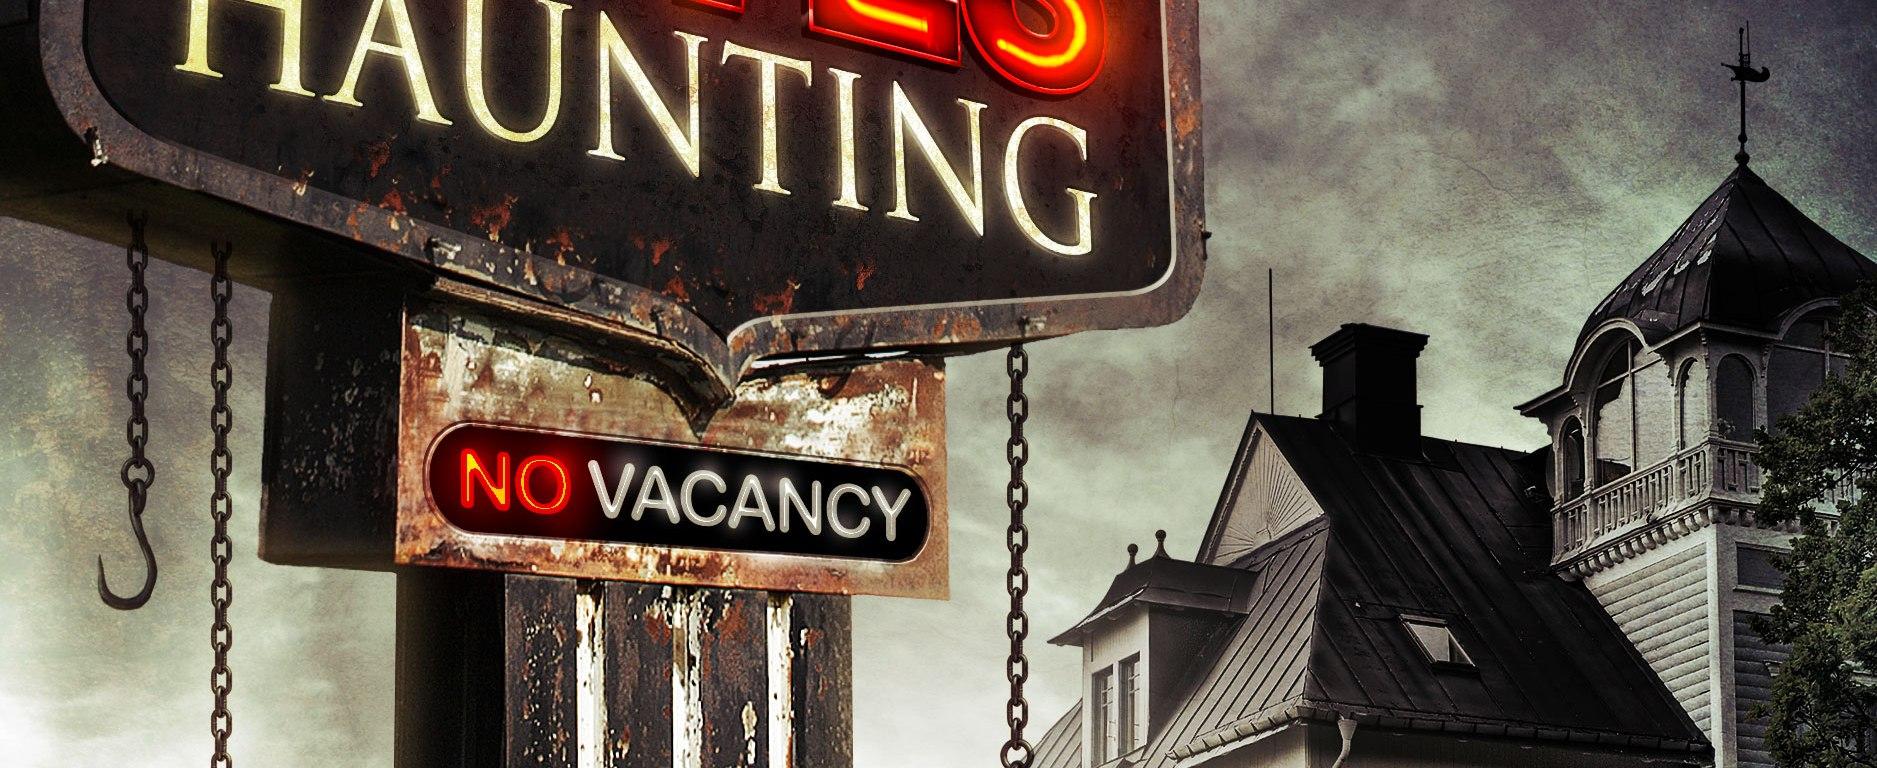 The Bates Hunting